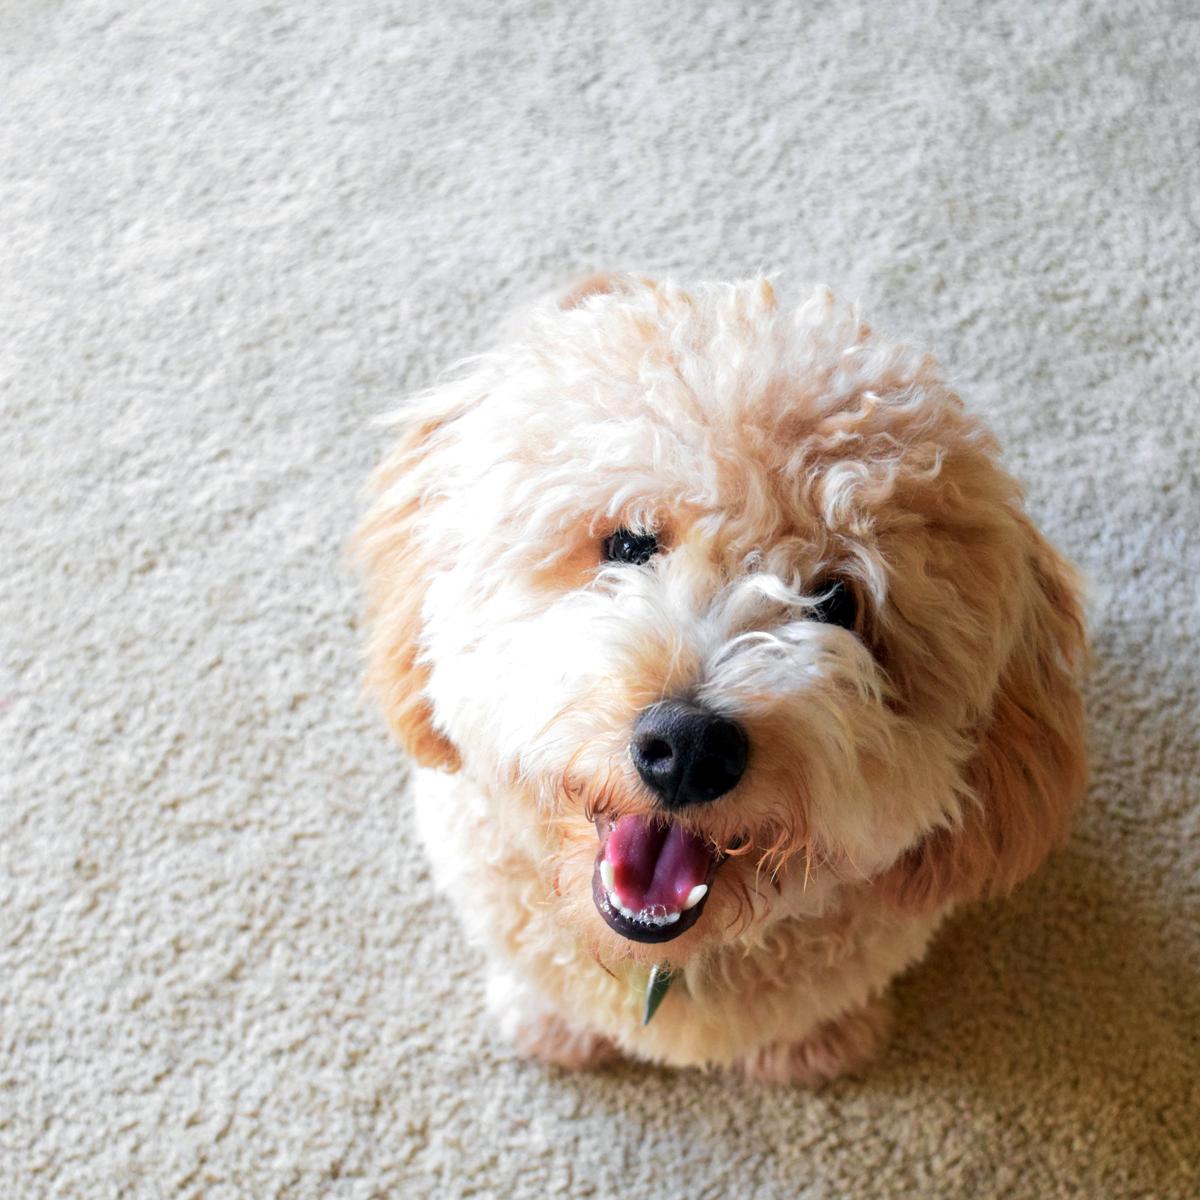 So smiling